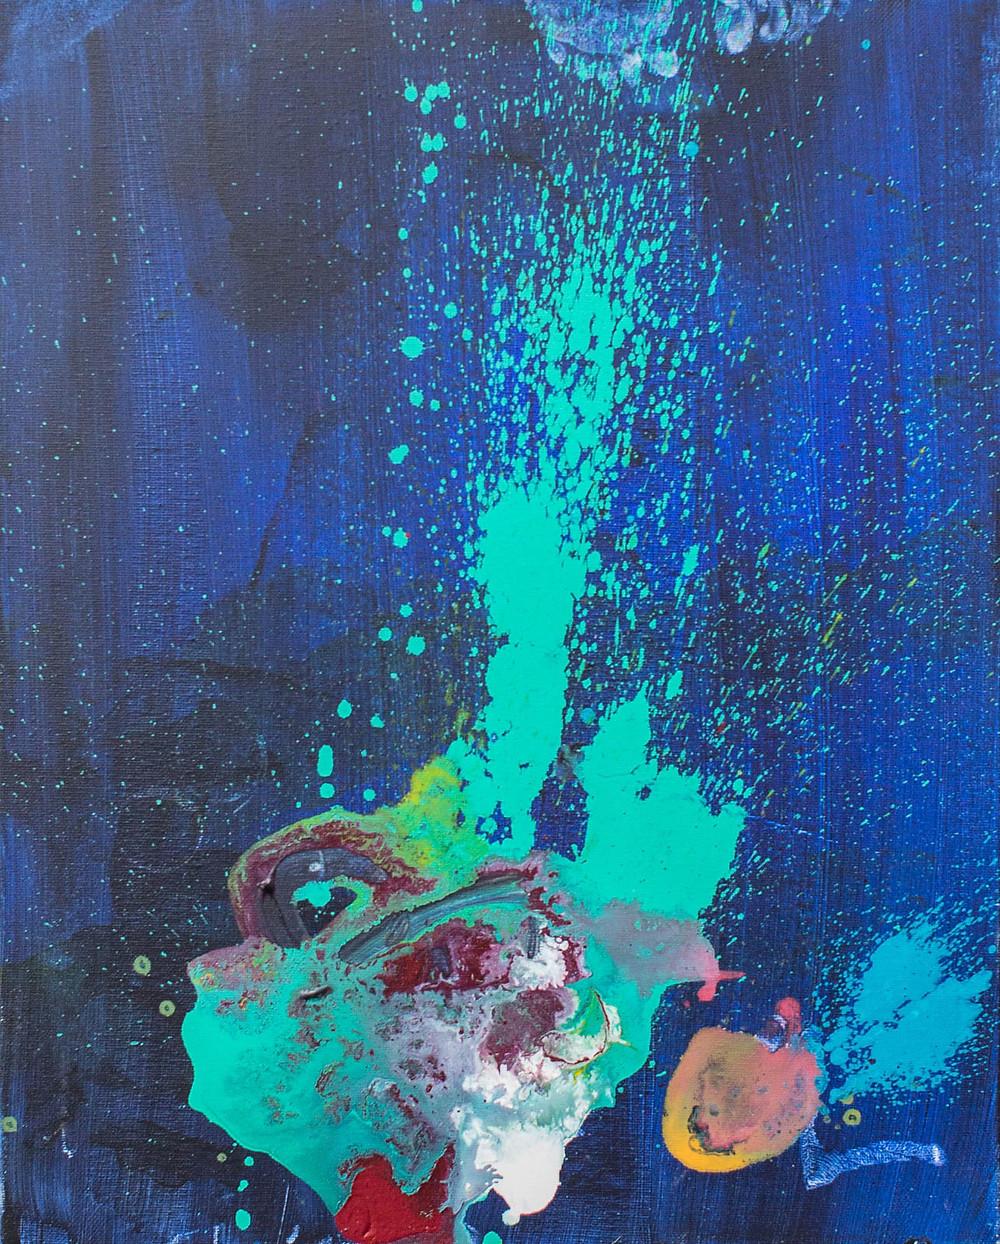 Cake Sprinkles, 2015 (Apollonia Cervantes) 16 x 20 in Acrylic